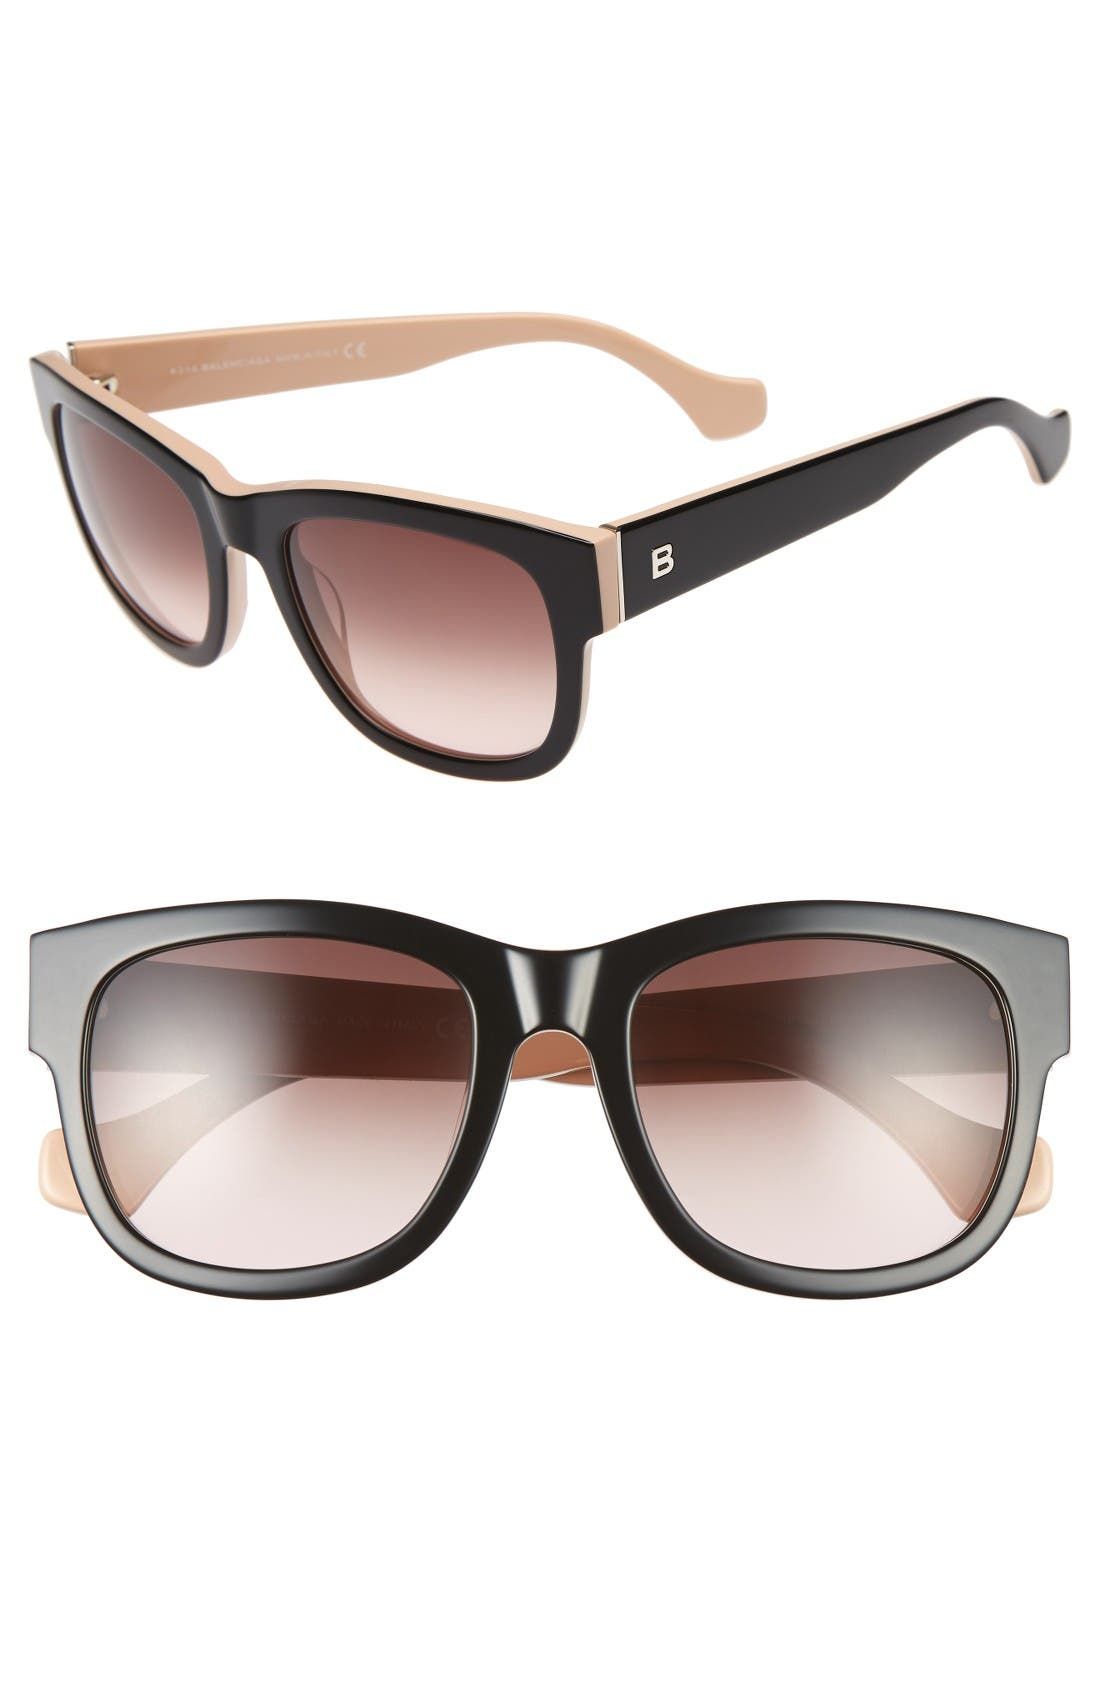 Alternate Image 1 Selected - Balenciaga 54mm Retro Sunglasses